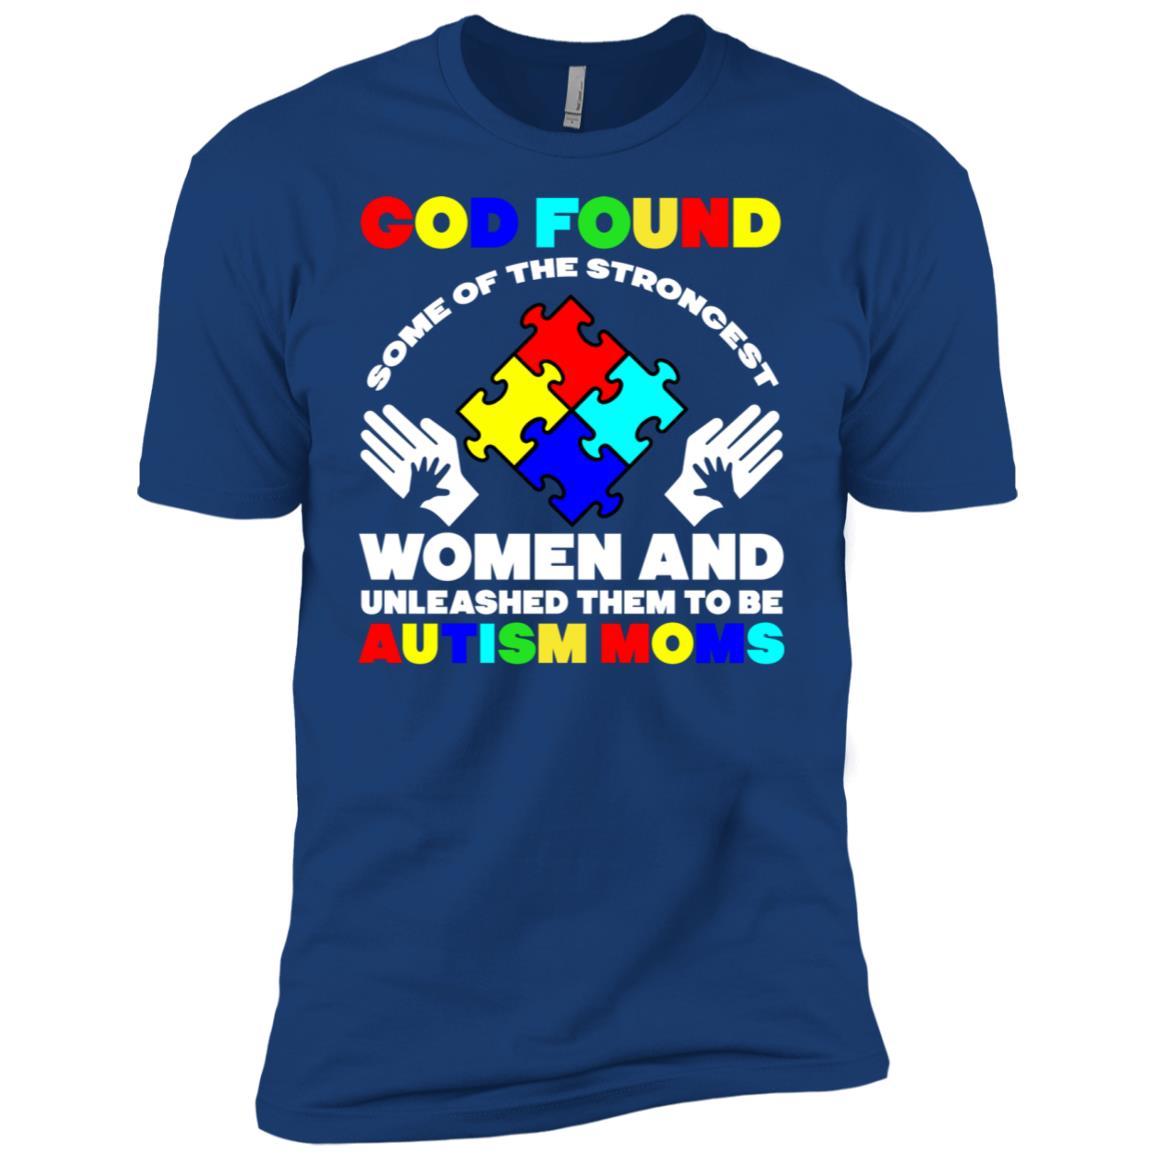 God Found Autism Moms Autism Awareness s Men Short Sleeve T-Shirt